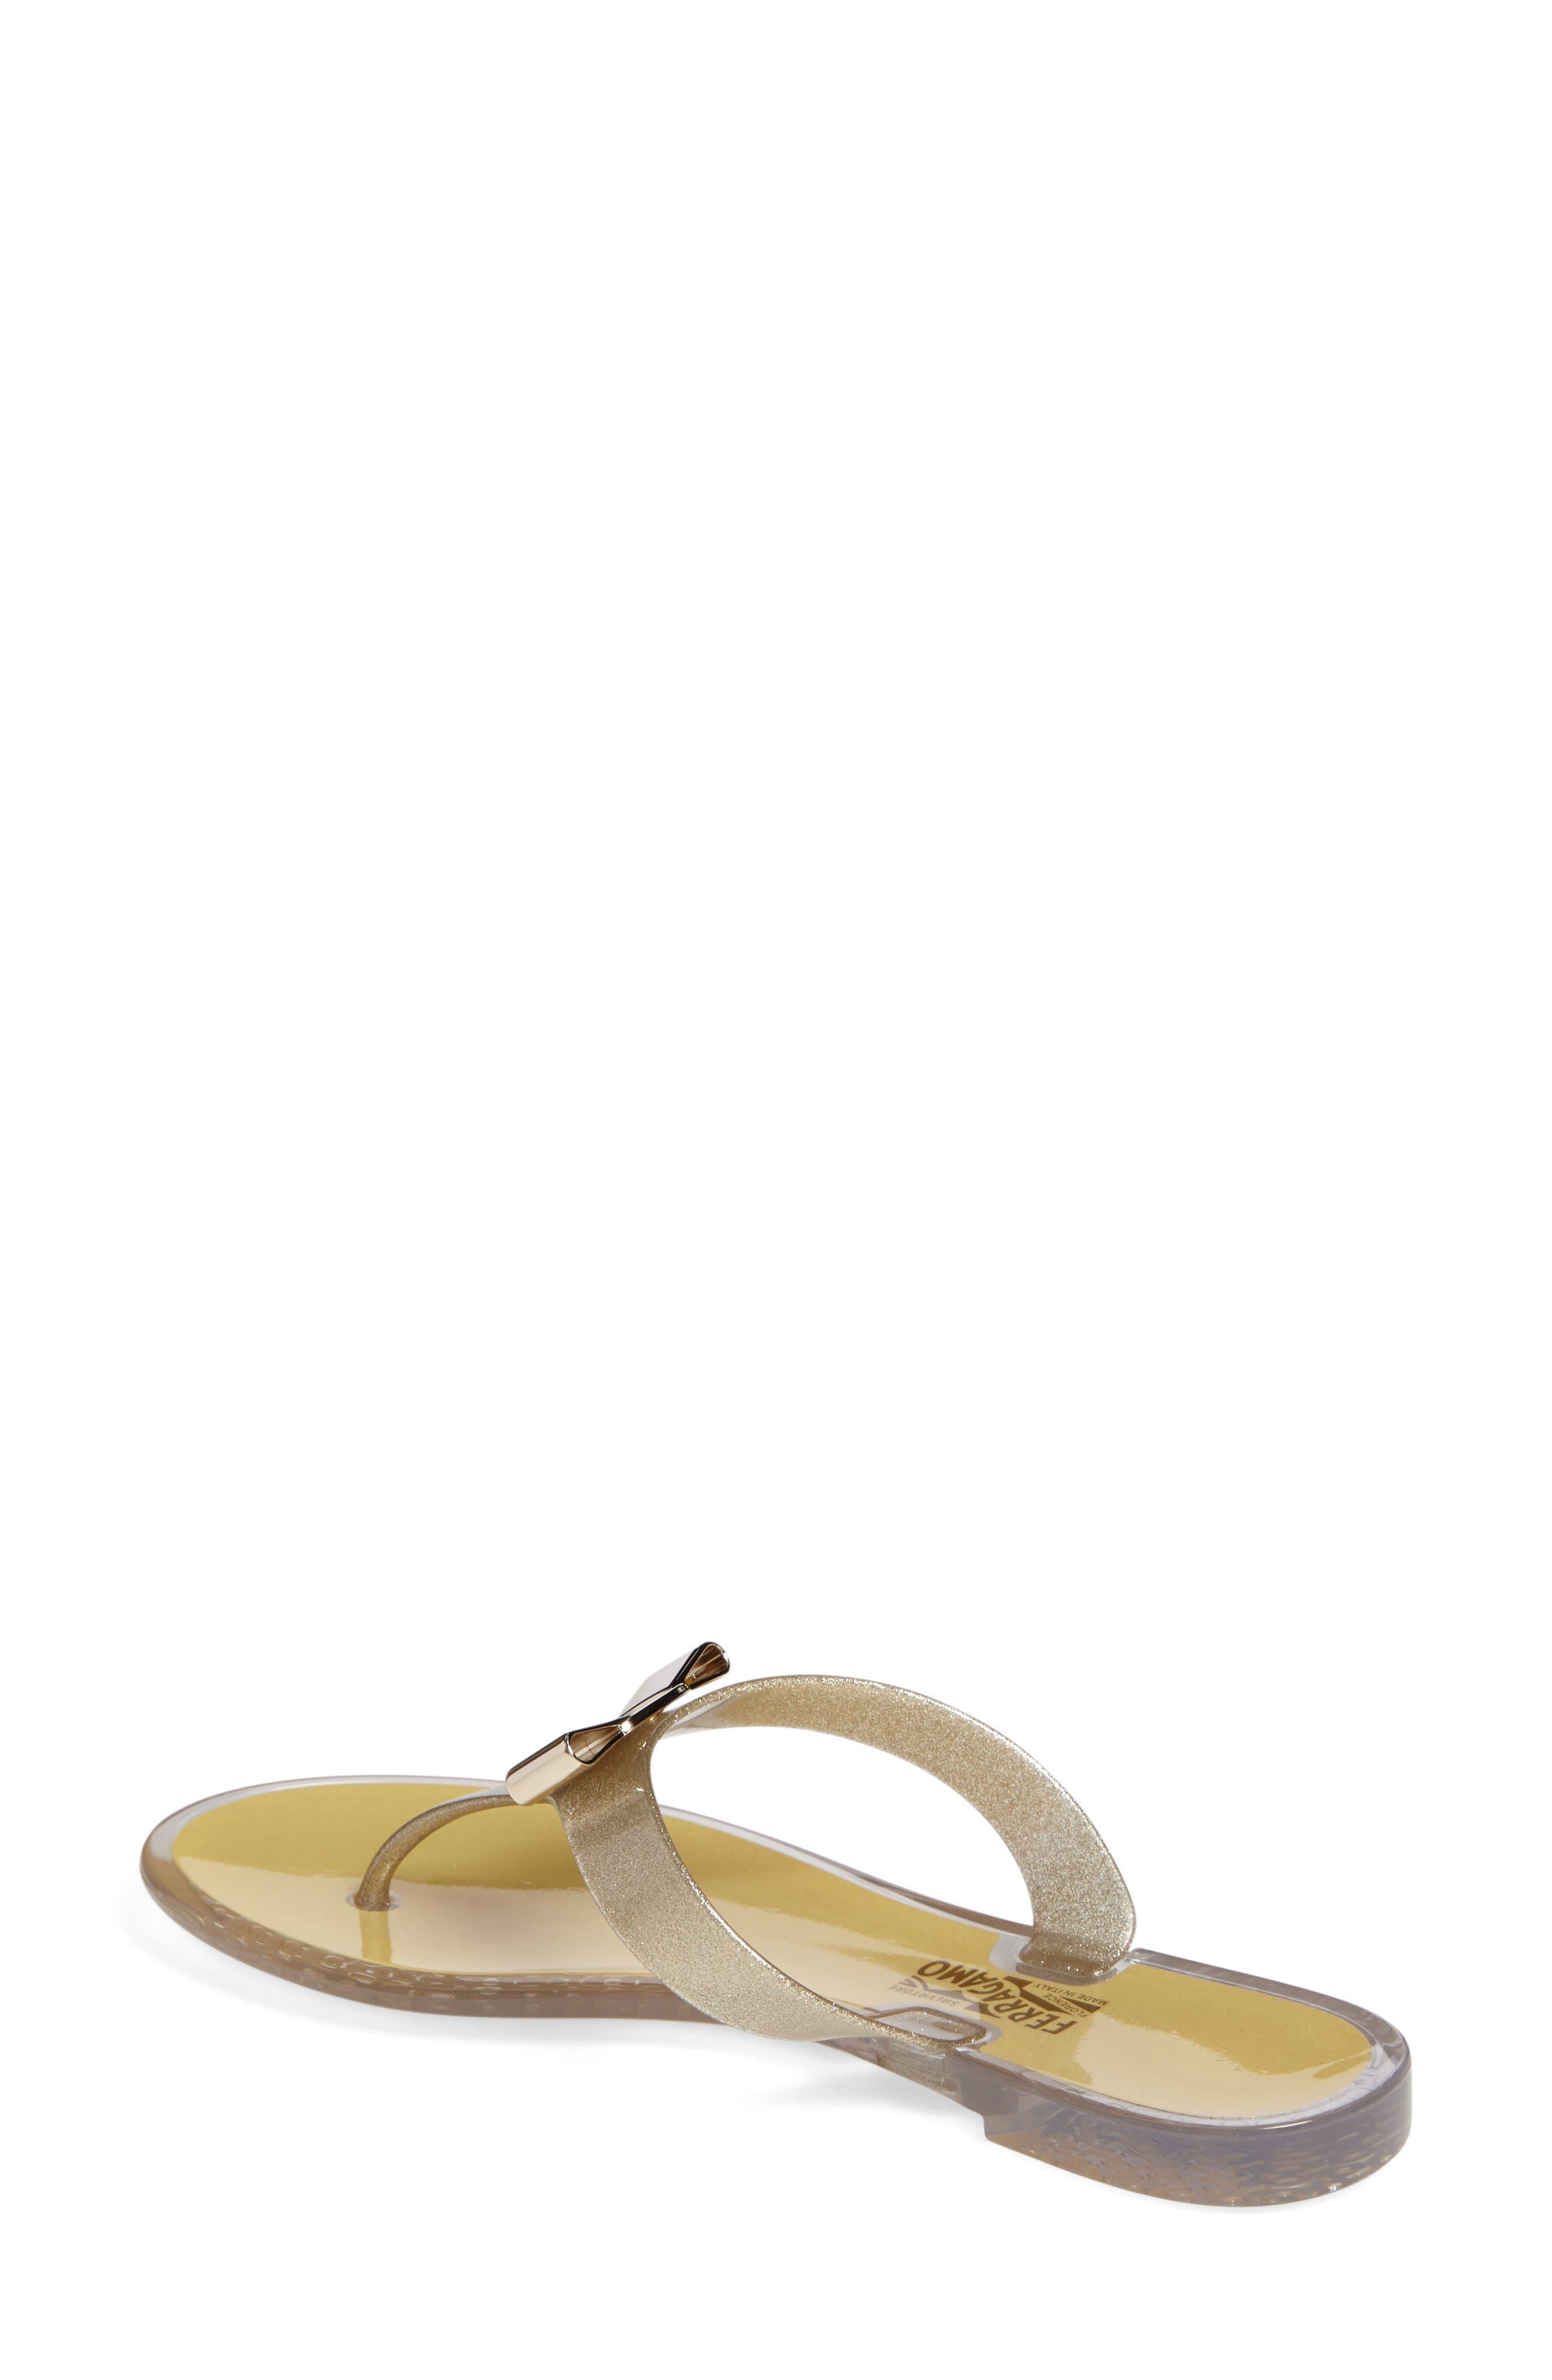 Jelly Flat Bow Sandal,                             Alternate thumbnail 2, color,